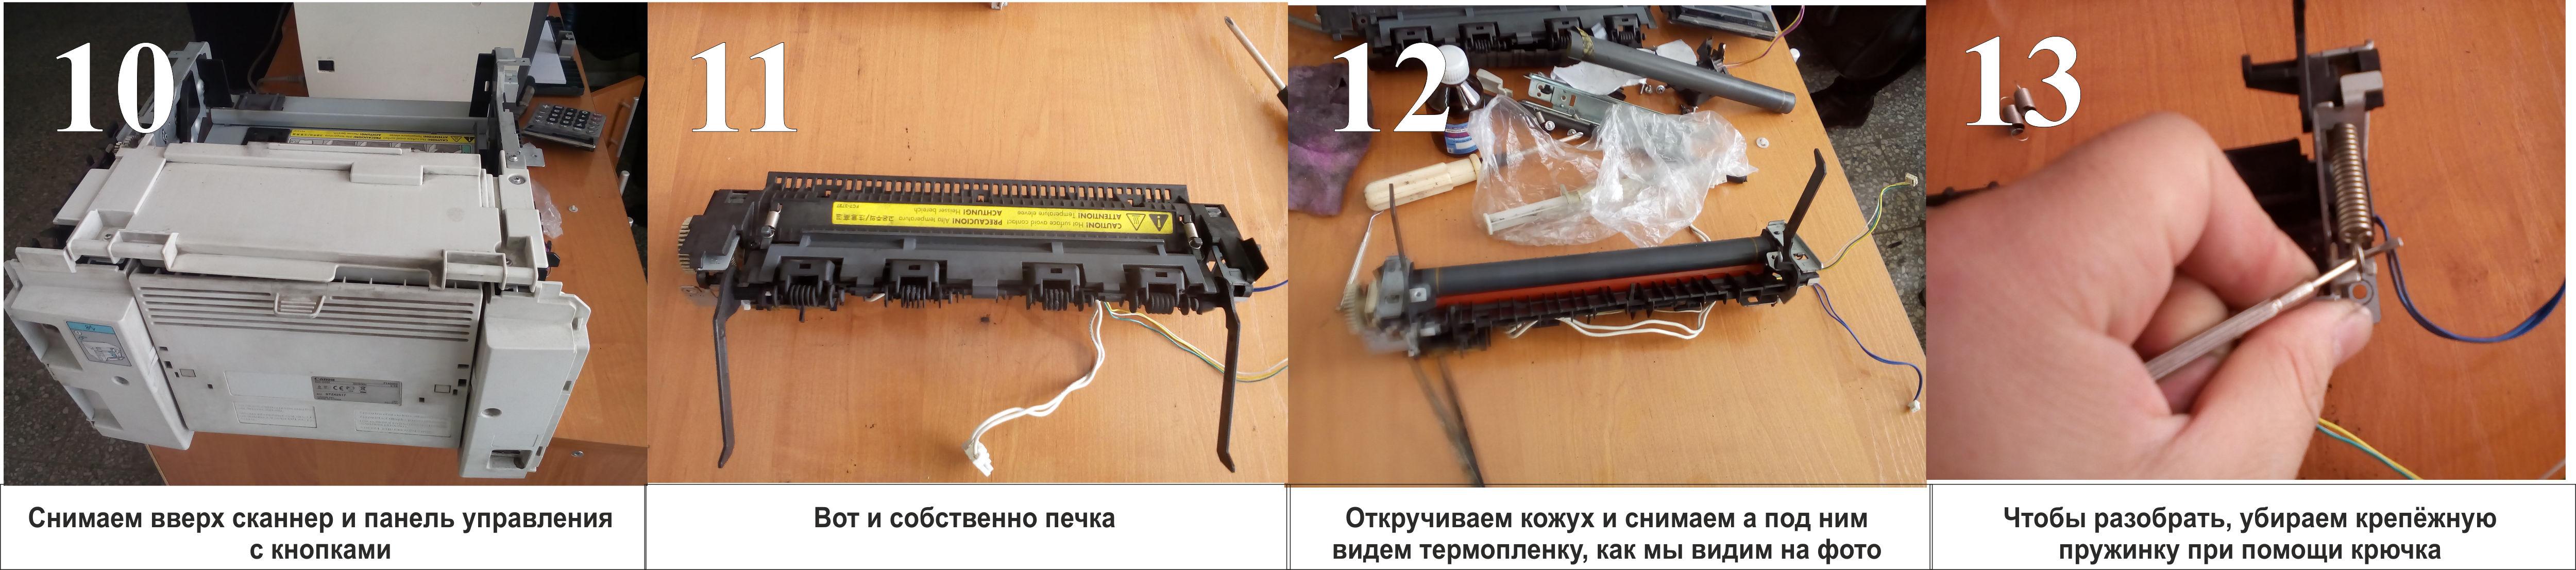 http://s6.uploads.ru/tExra.jpg